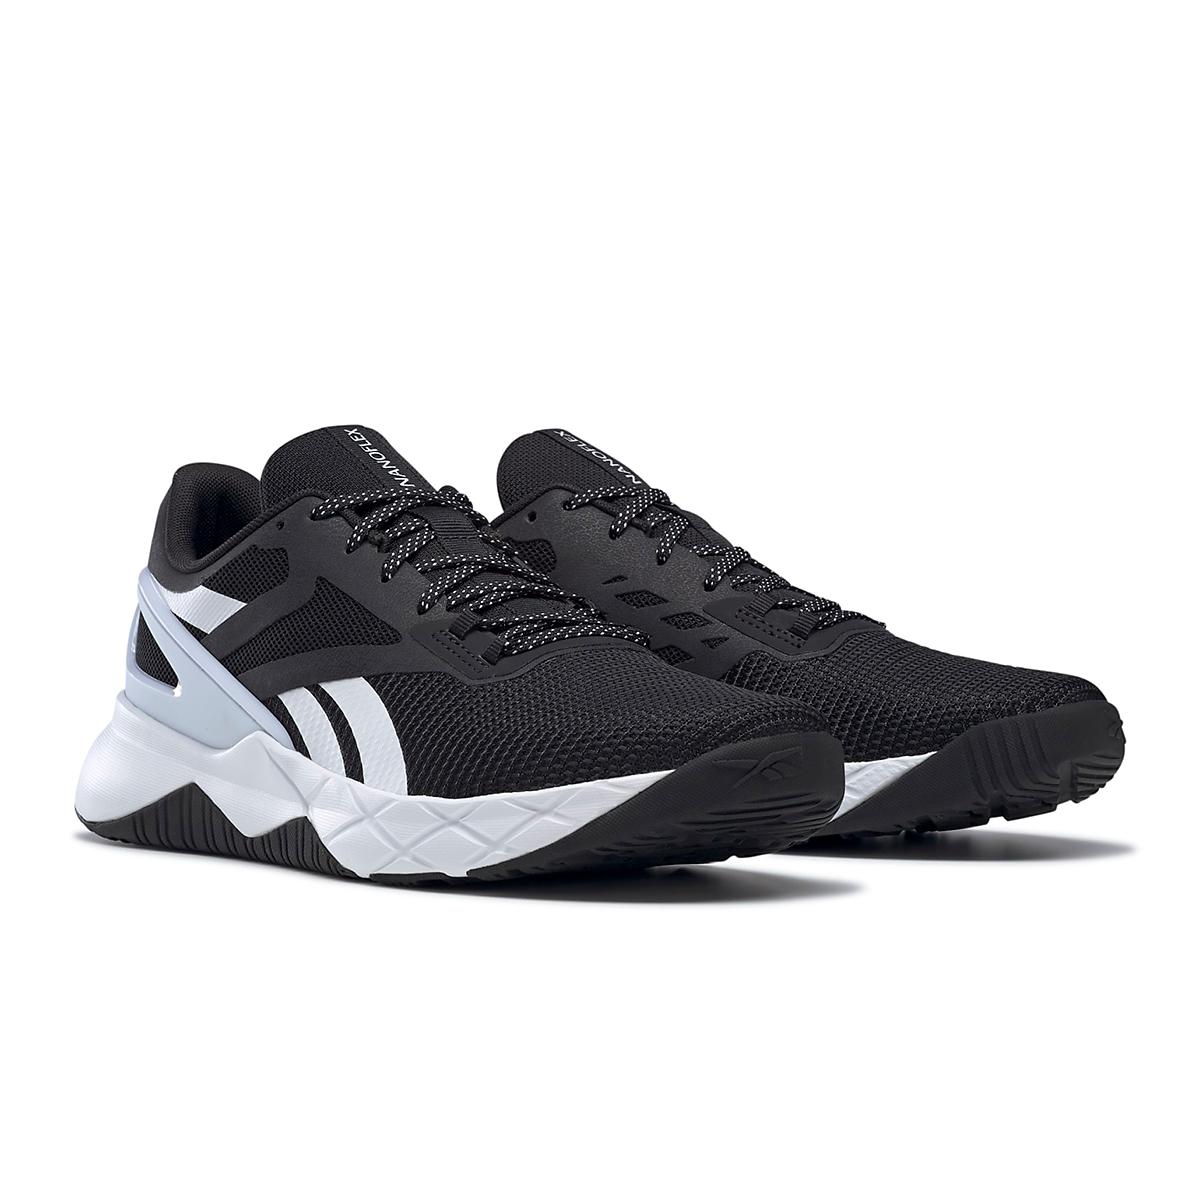 Men's Reebok Nanoflex TR Training Shoe - Color: Core Black/White/Core Black - Size: 6.5 - Width: Regular, Core Black/White/Core Black, large, image 3